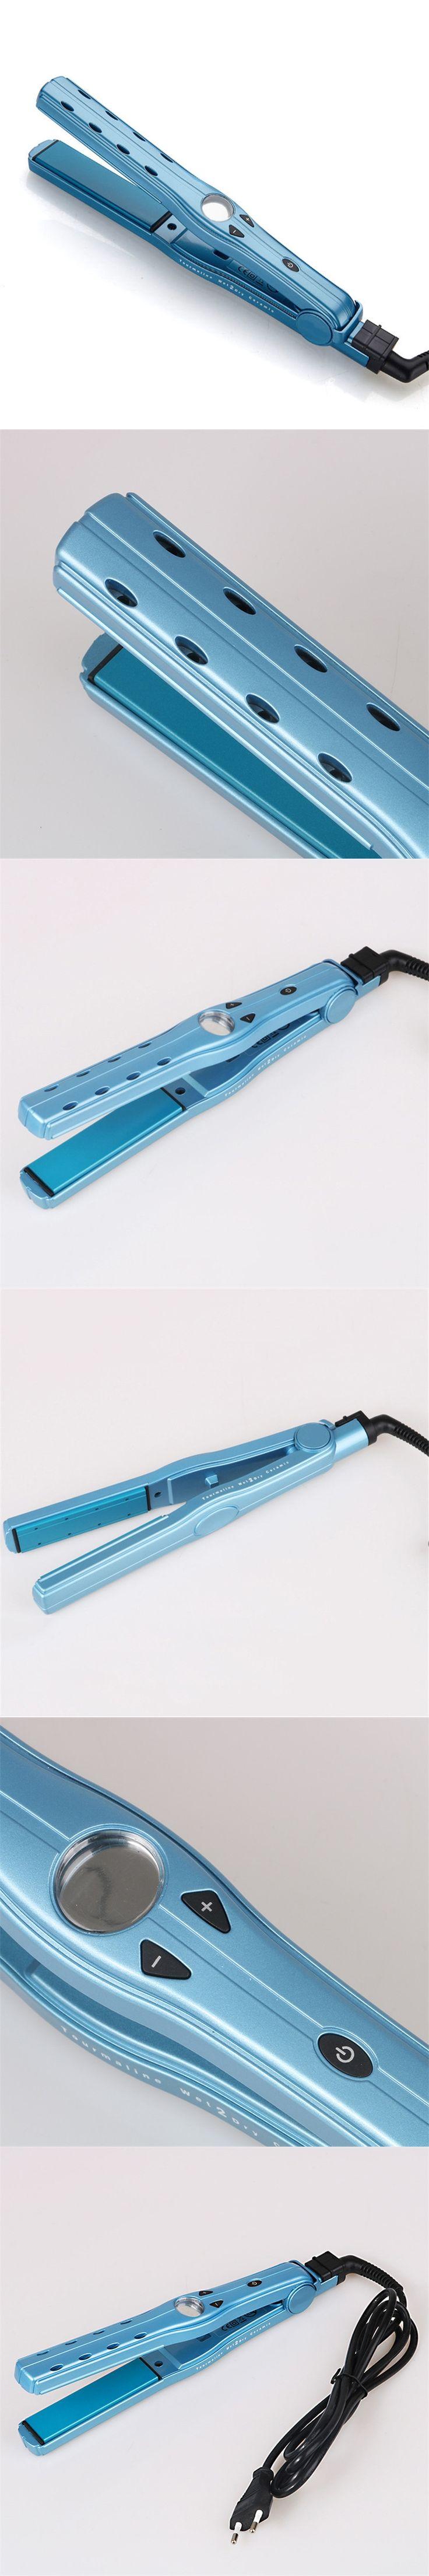 Health Tools 1Pcs Flat Iron Digital Anti Static Tourmaline Ceramic Hair Straightener With Temp Setting Hair Stylings